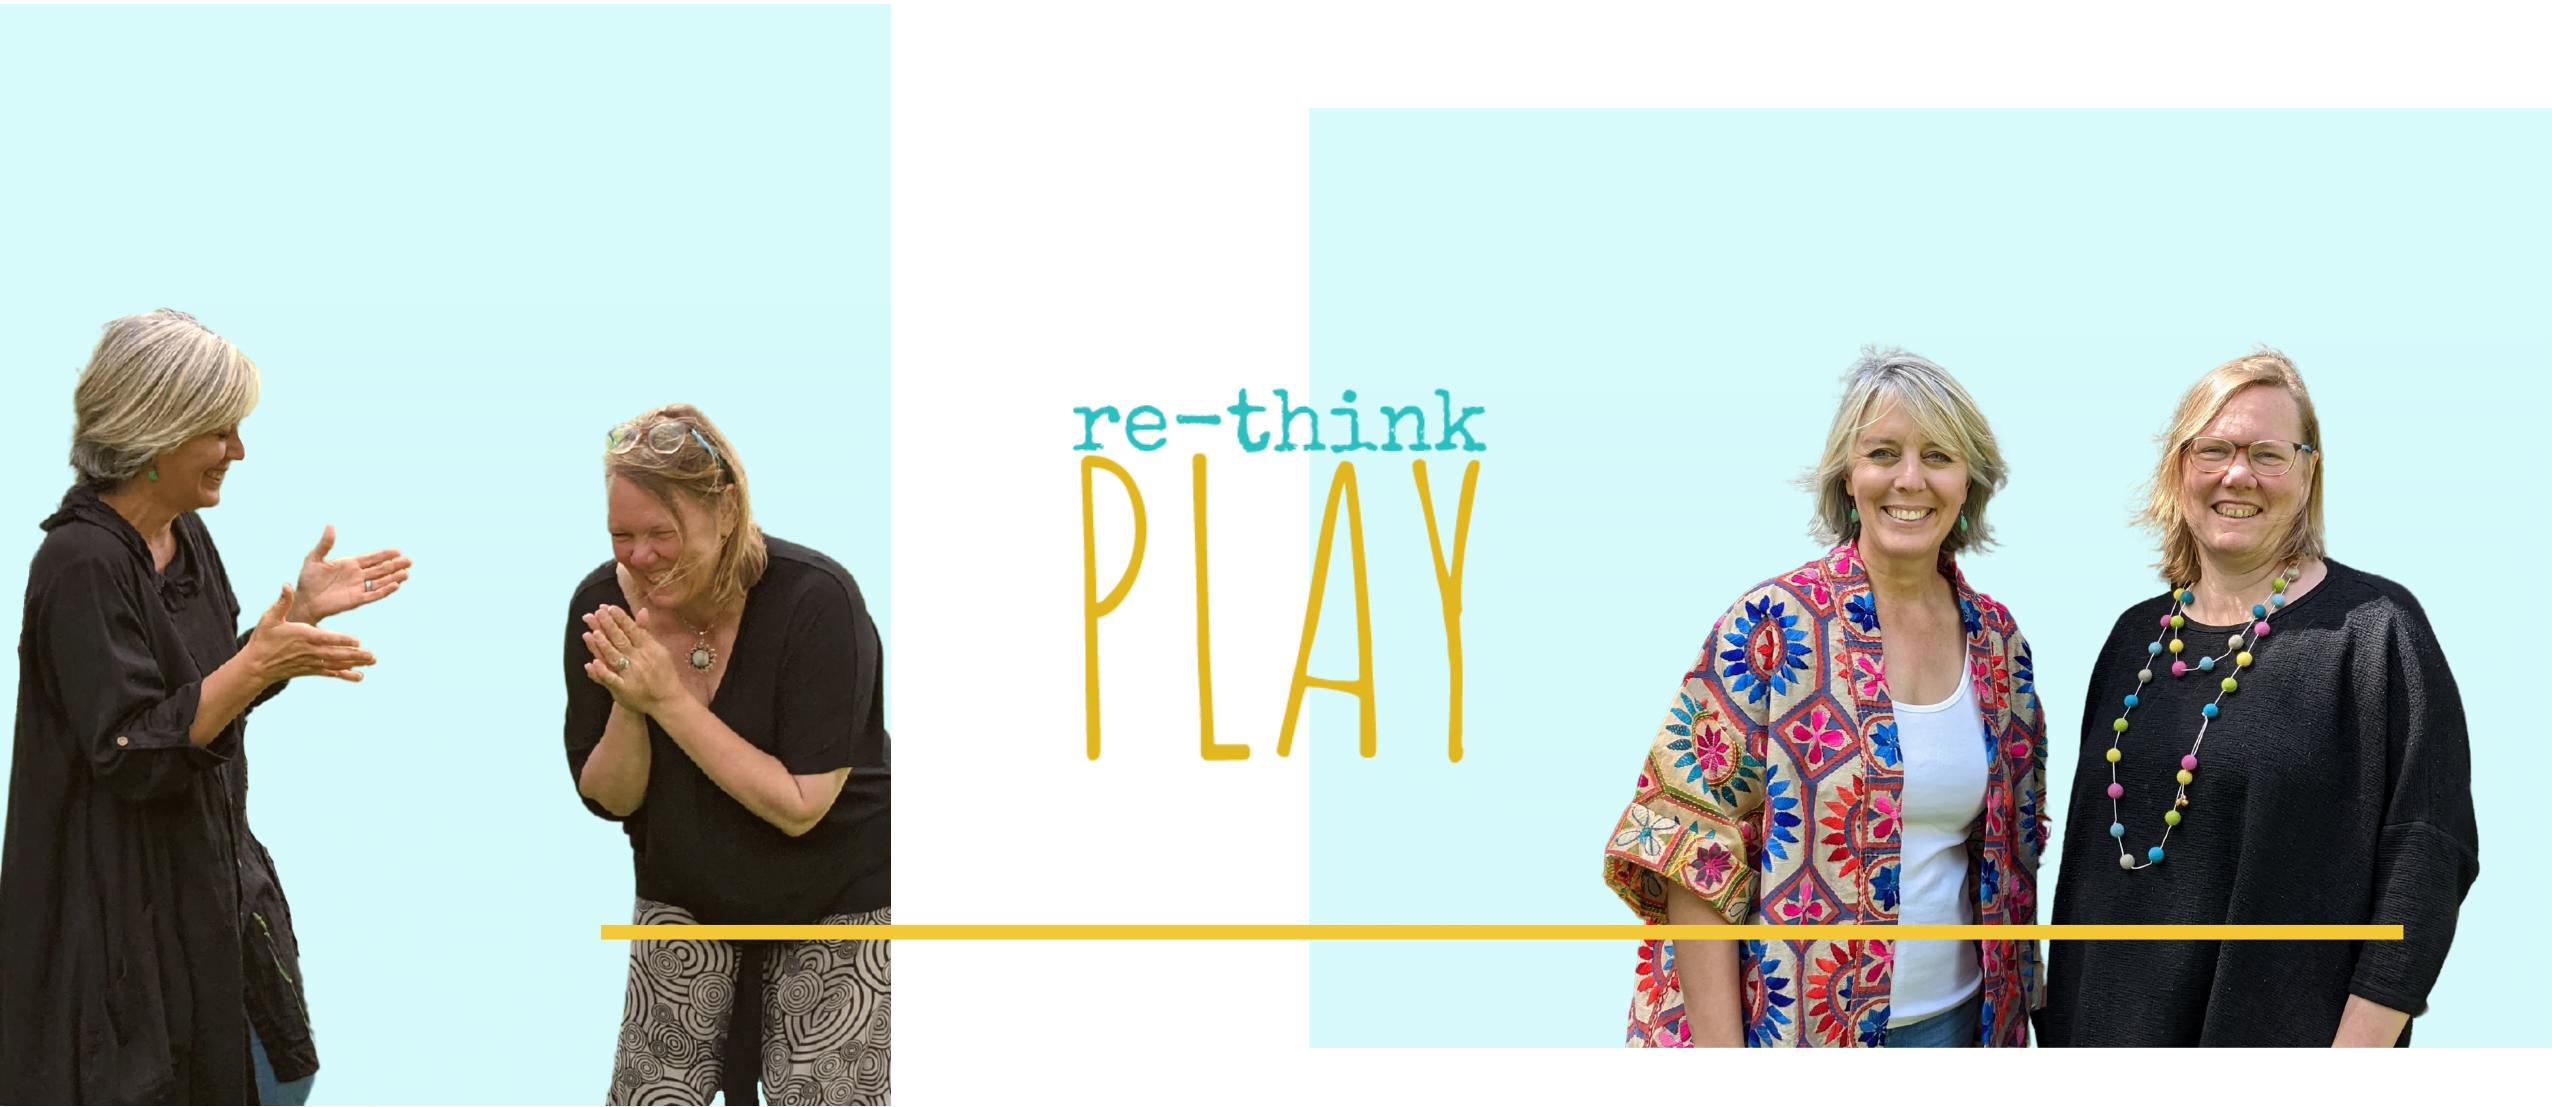 Rethink Play